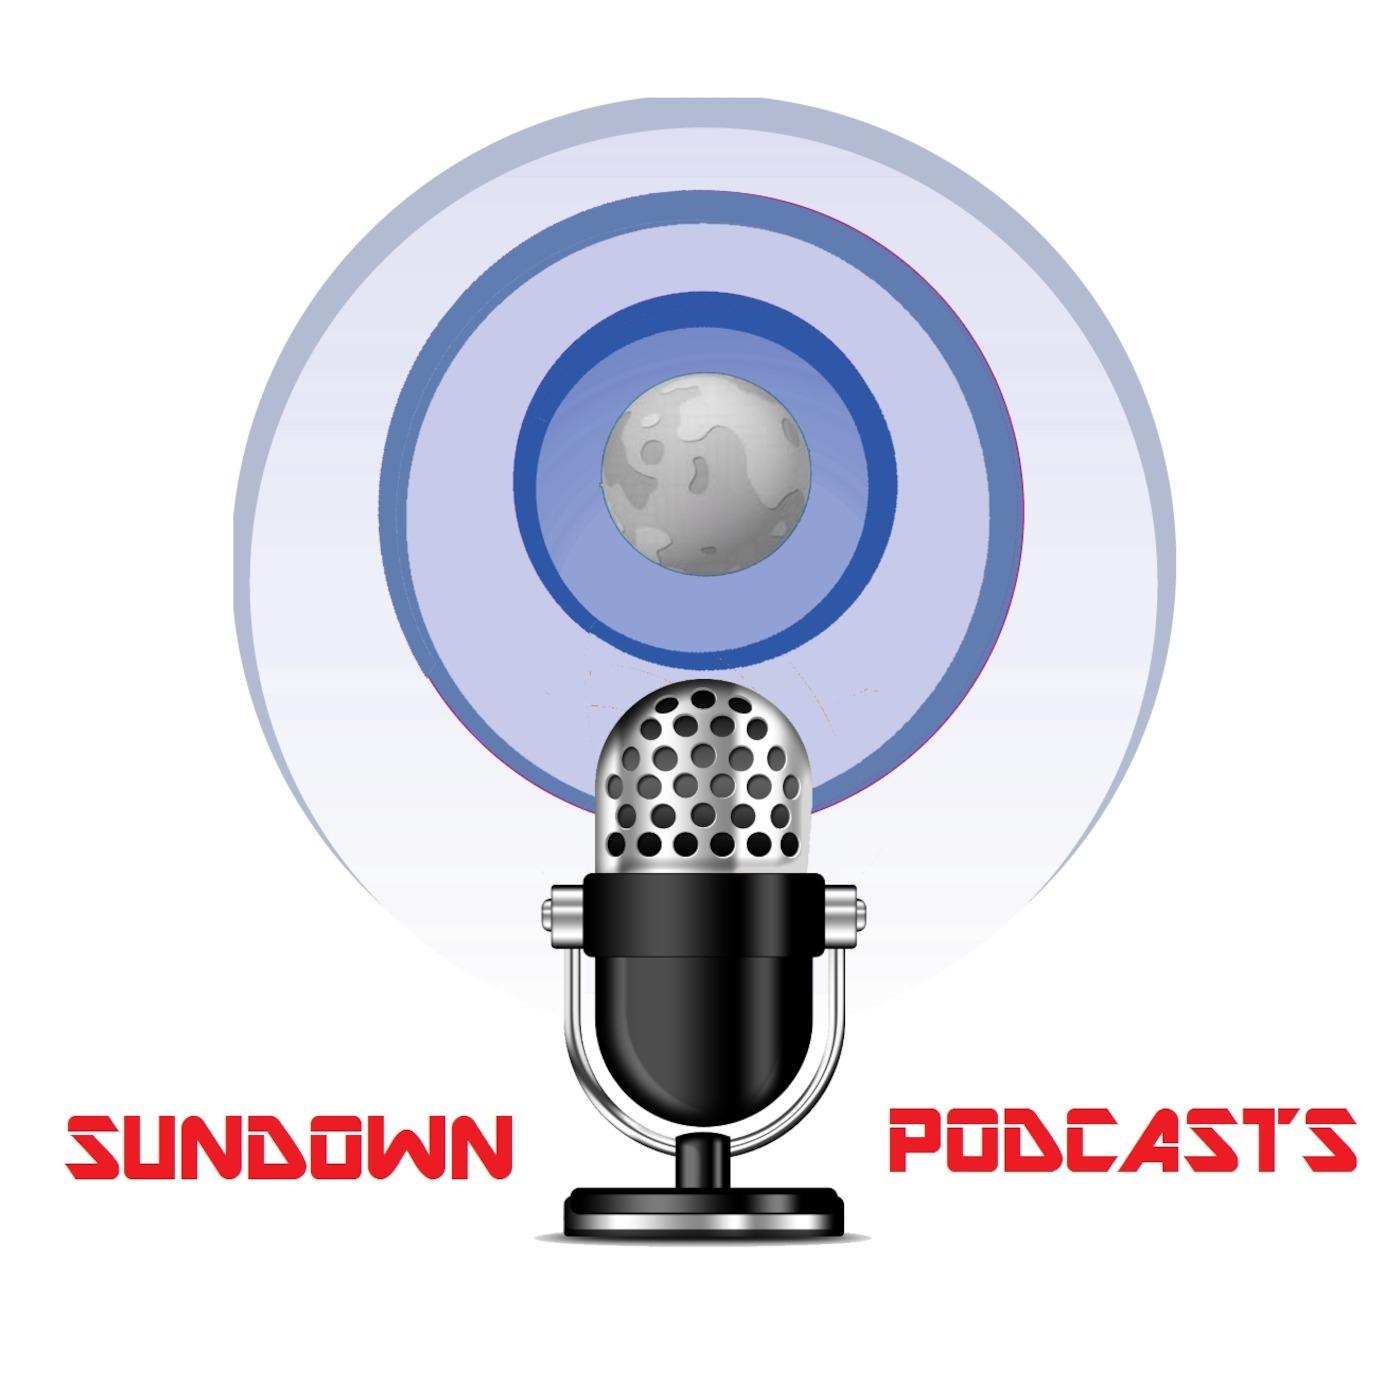 Sundown Podcasts' Podcast